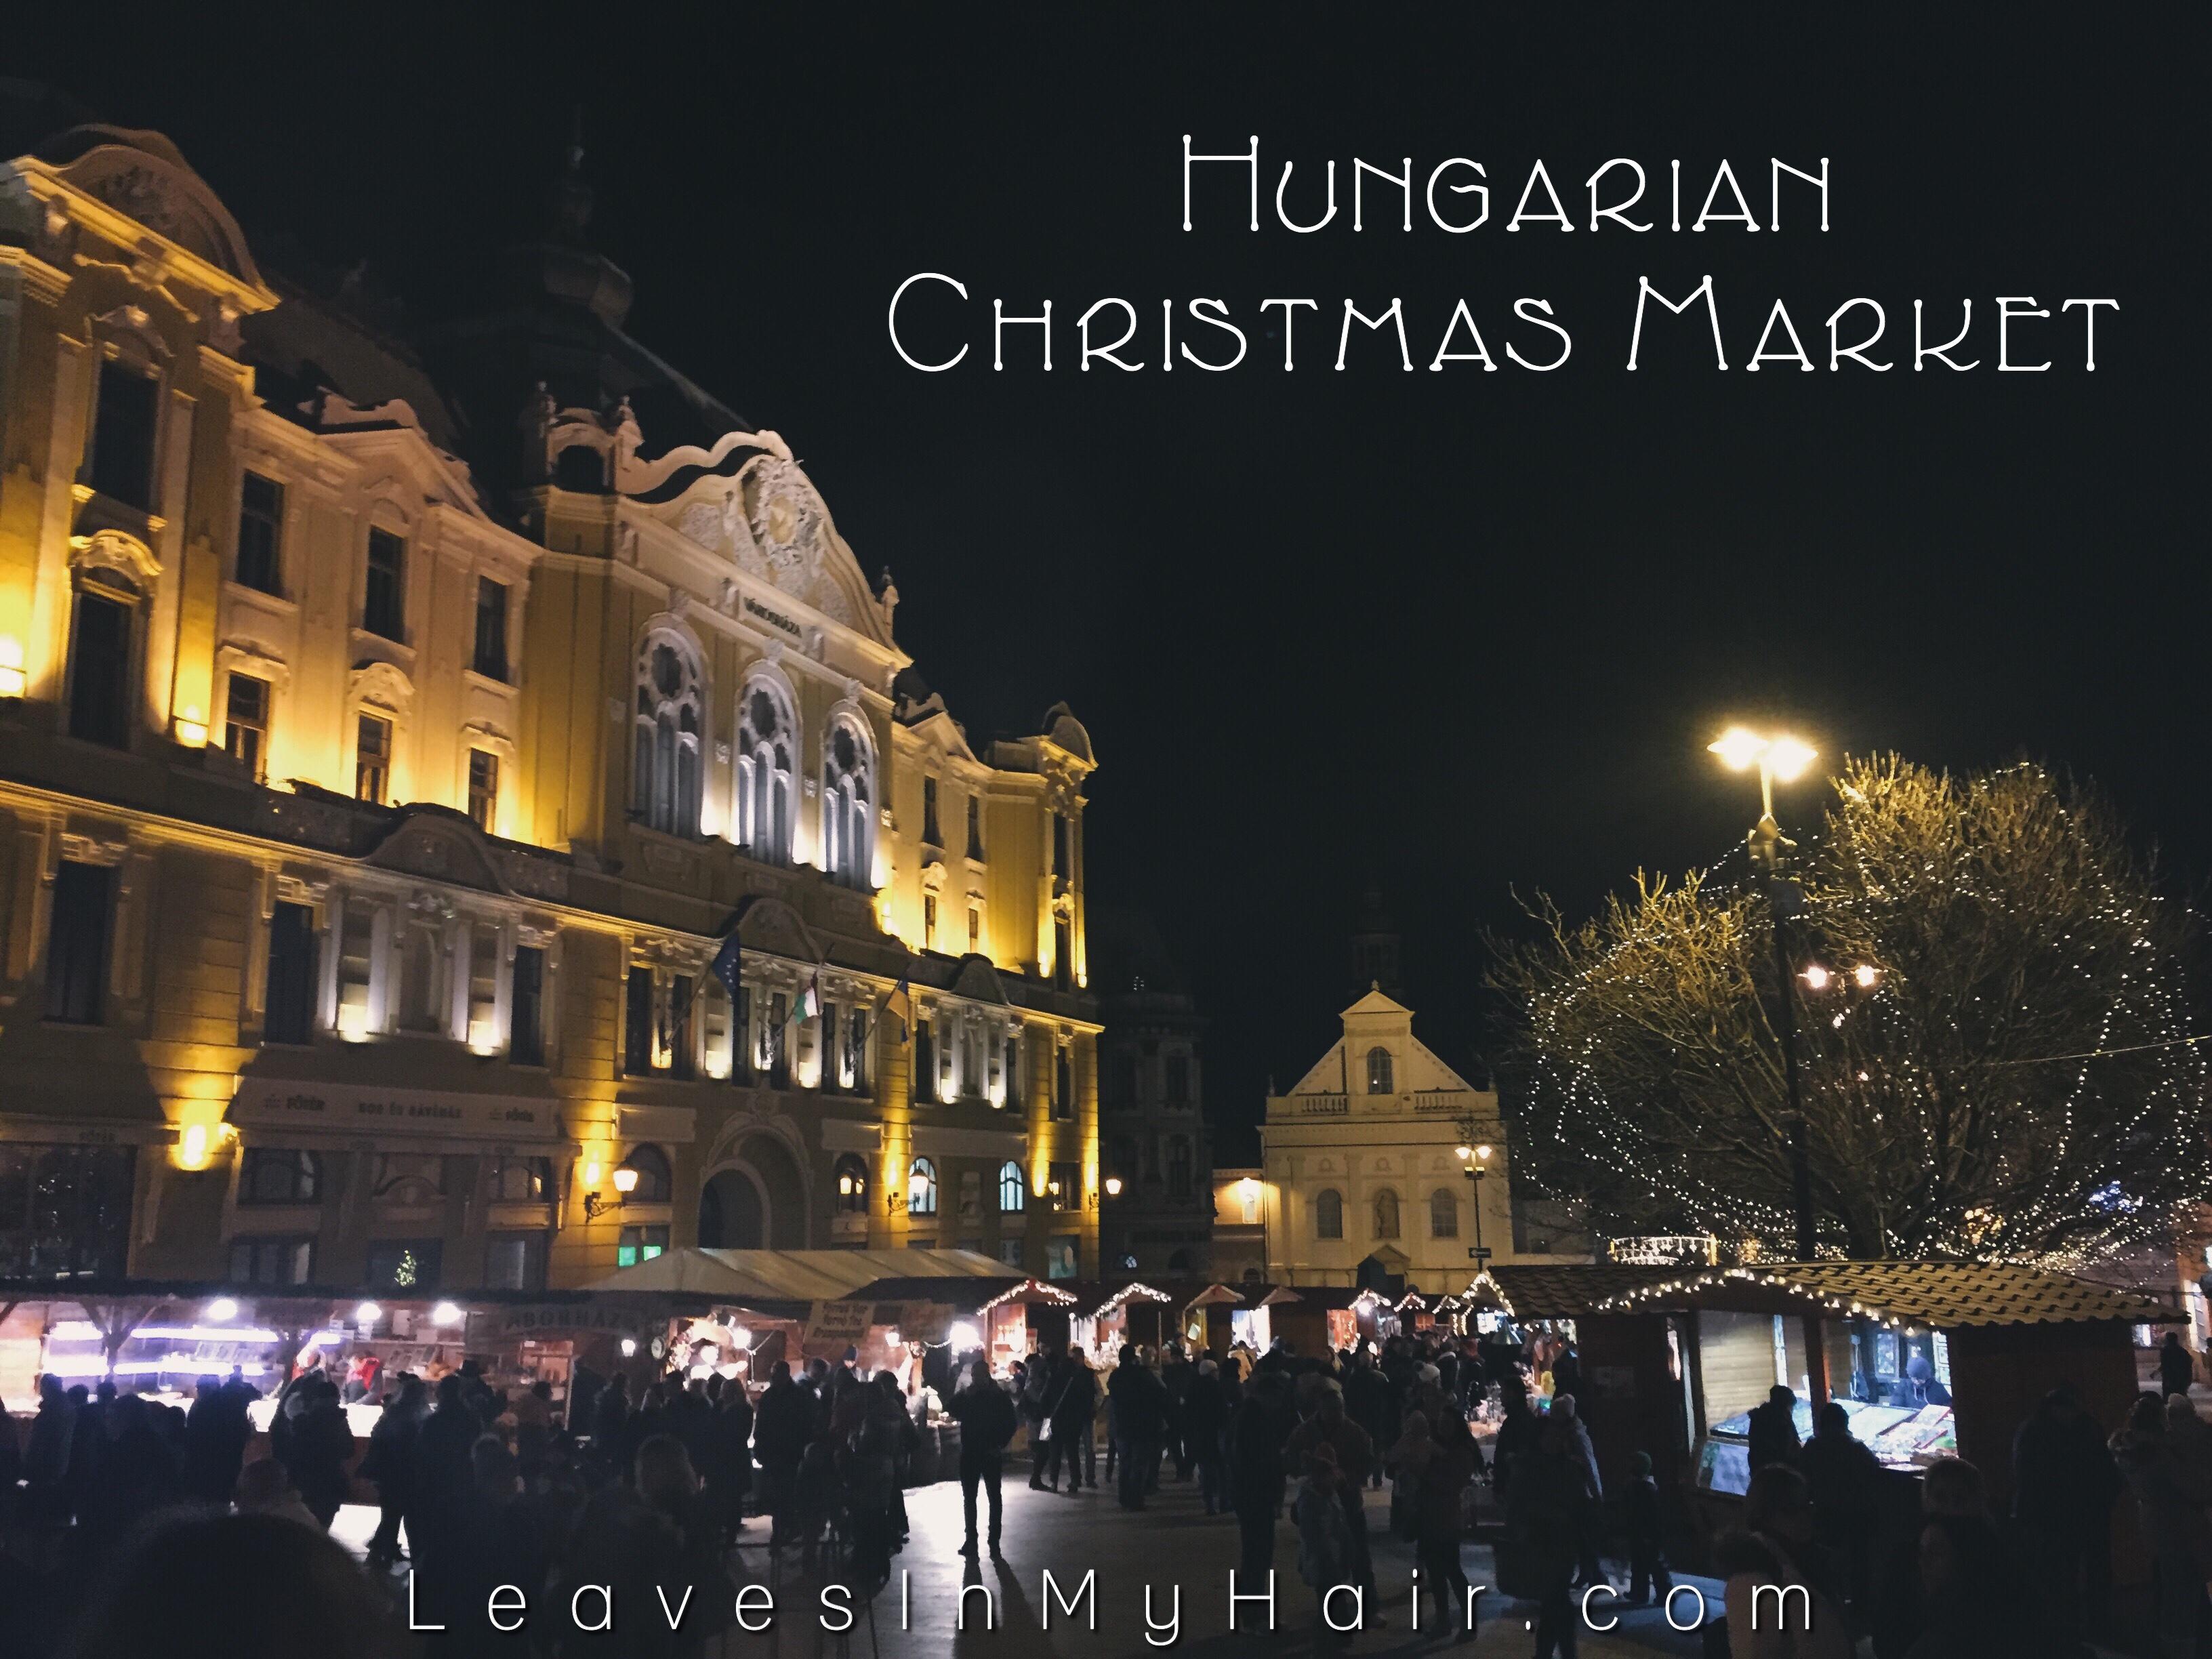 Hungarian Christmas Market